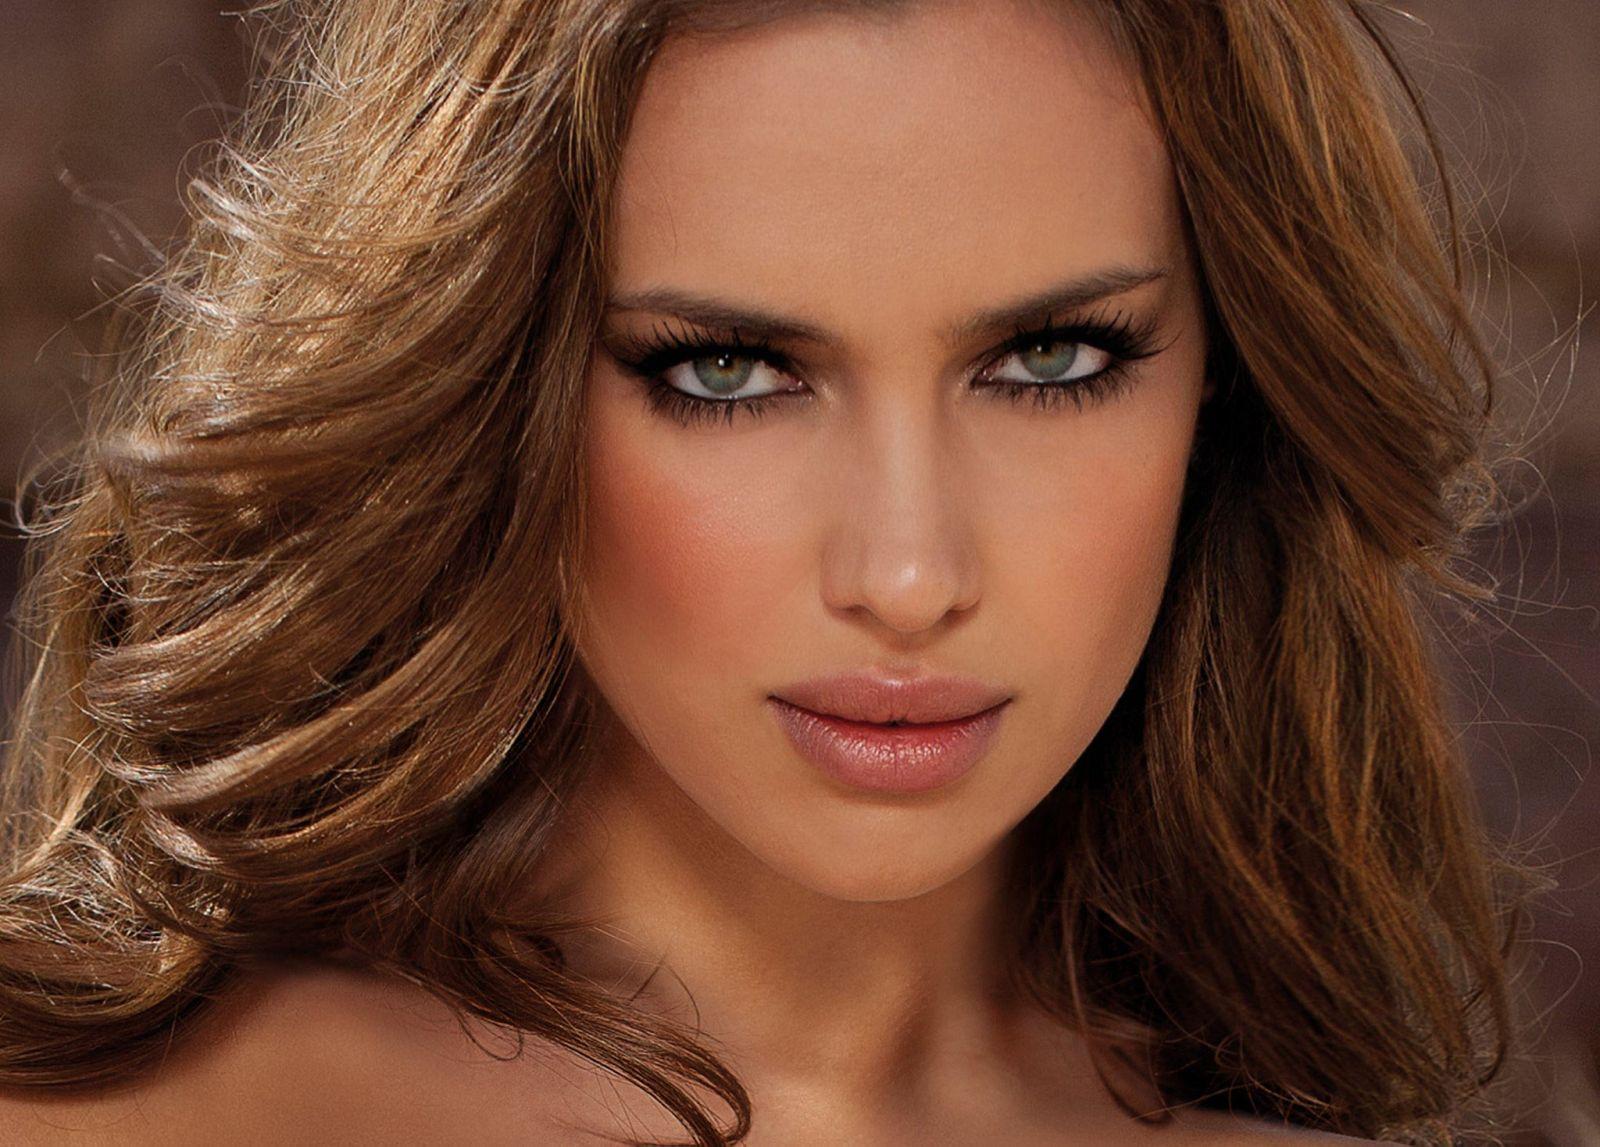 top 15 most beautiful russian girls in 2016